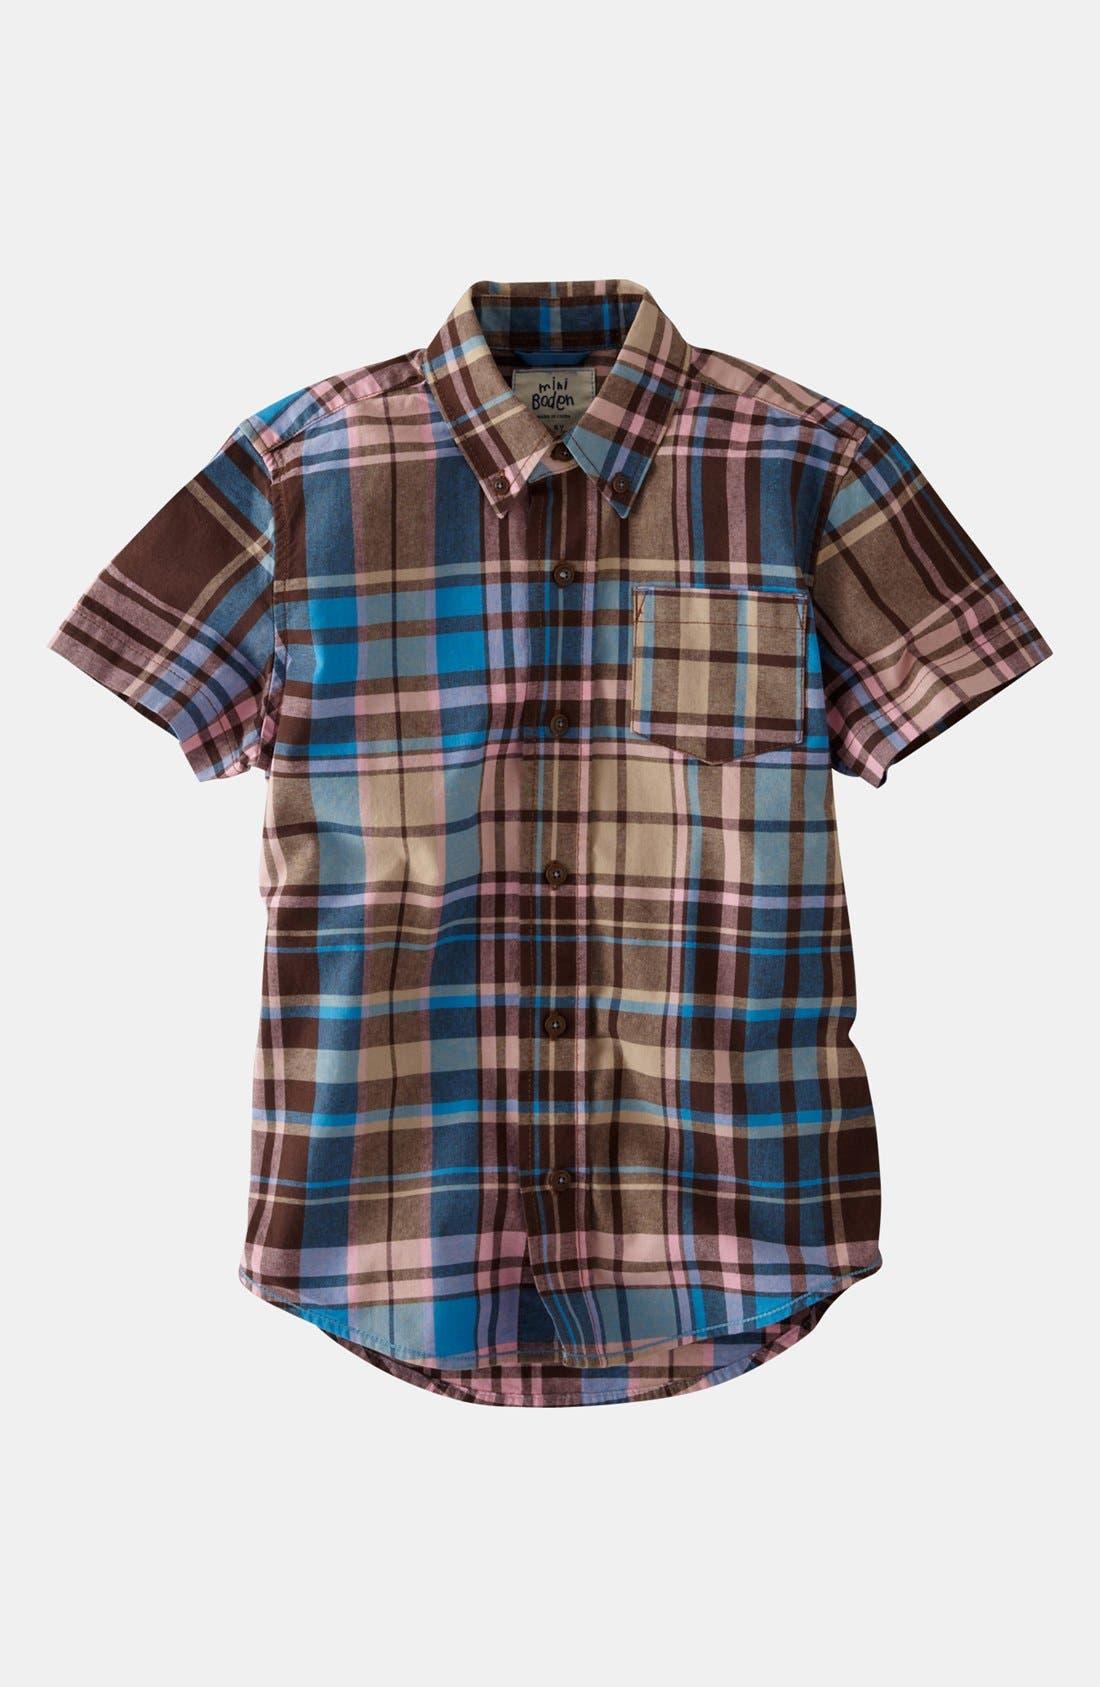 Main Image - Mini Boden 'Summer Check' Shirt (Little Boys & Big Boys)